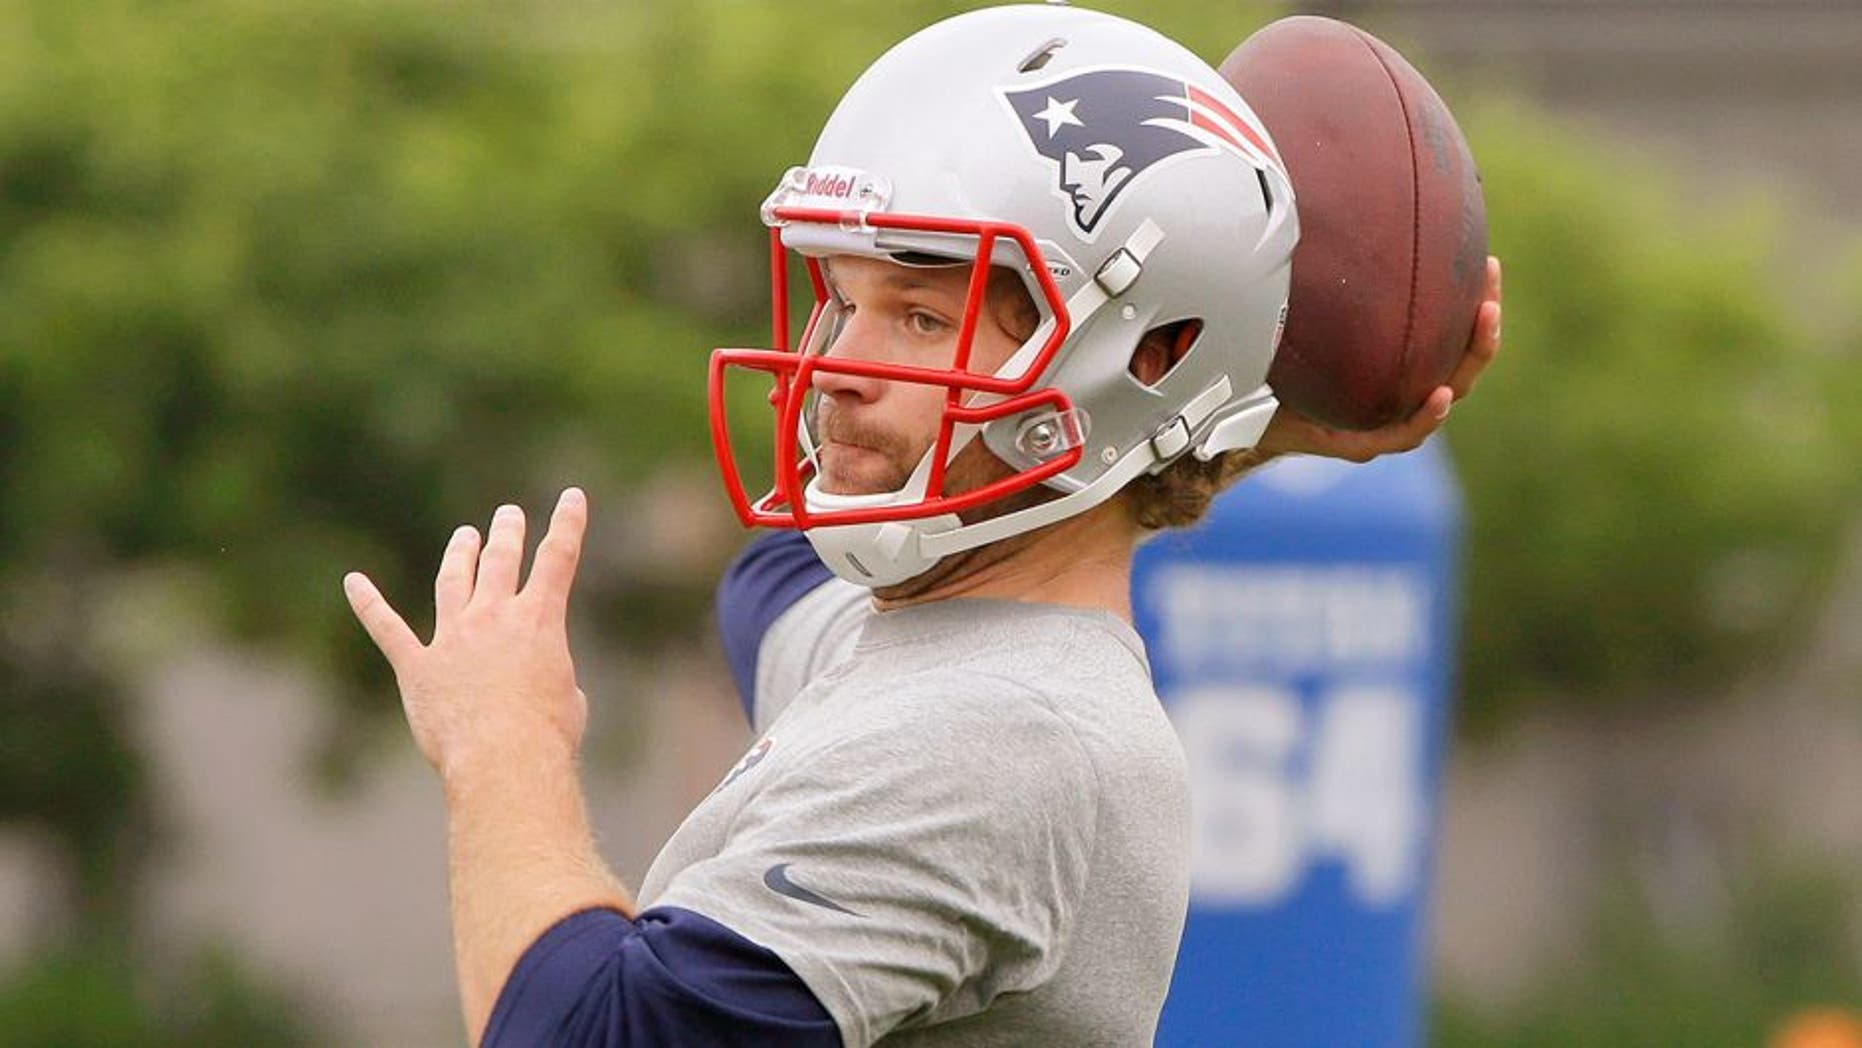 Newly acquired New England Patriots quarterback Matt Flynn (10) throws a pass during an NFL football minicamp Tuesday, June 16, 2015, in Foxborough, Mass. (AP Photo/Stephan Savoia)